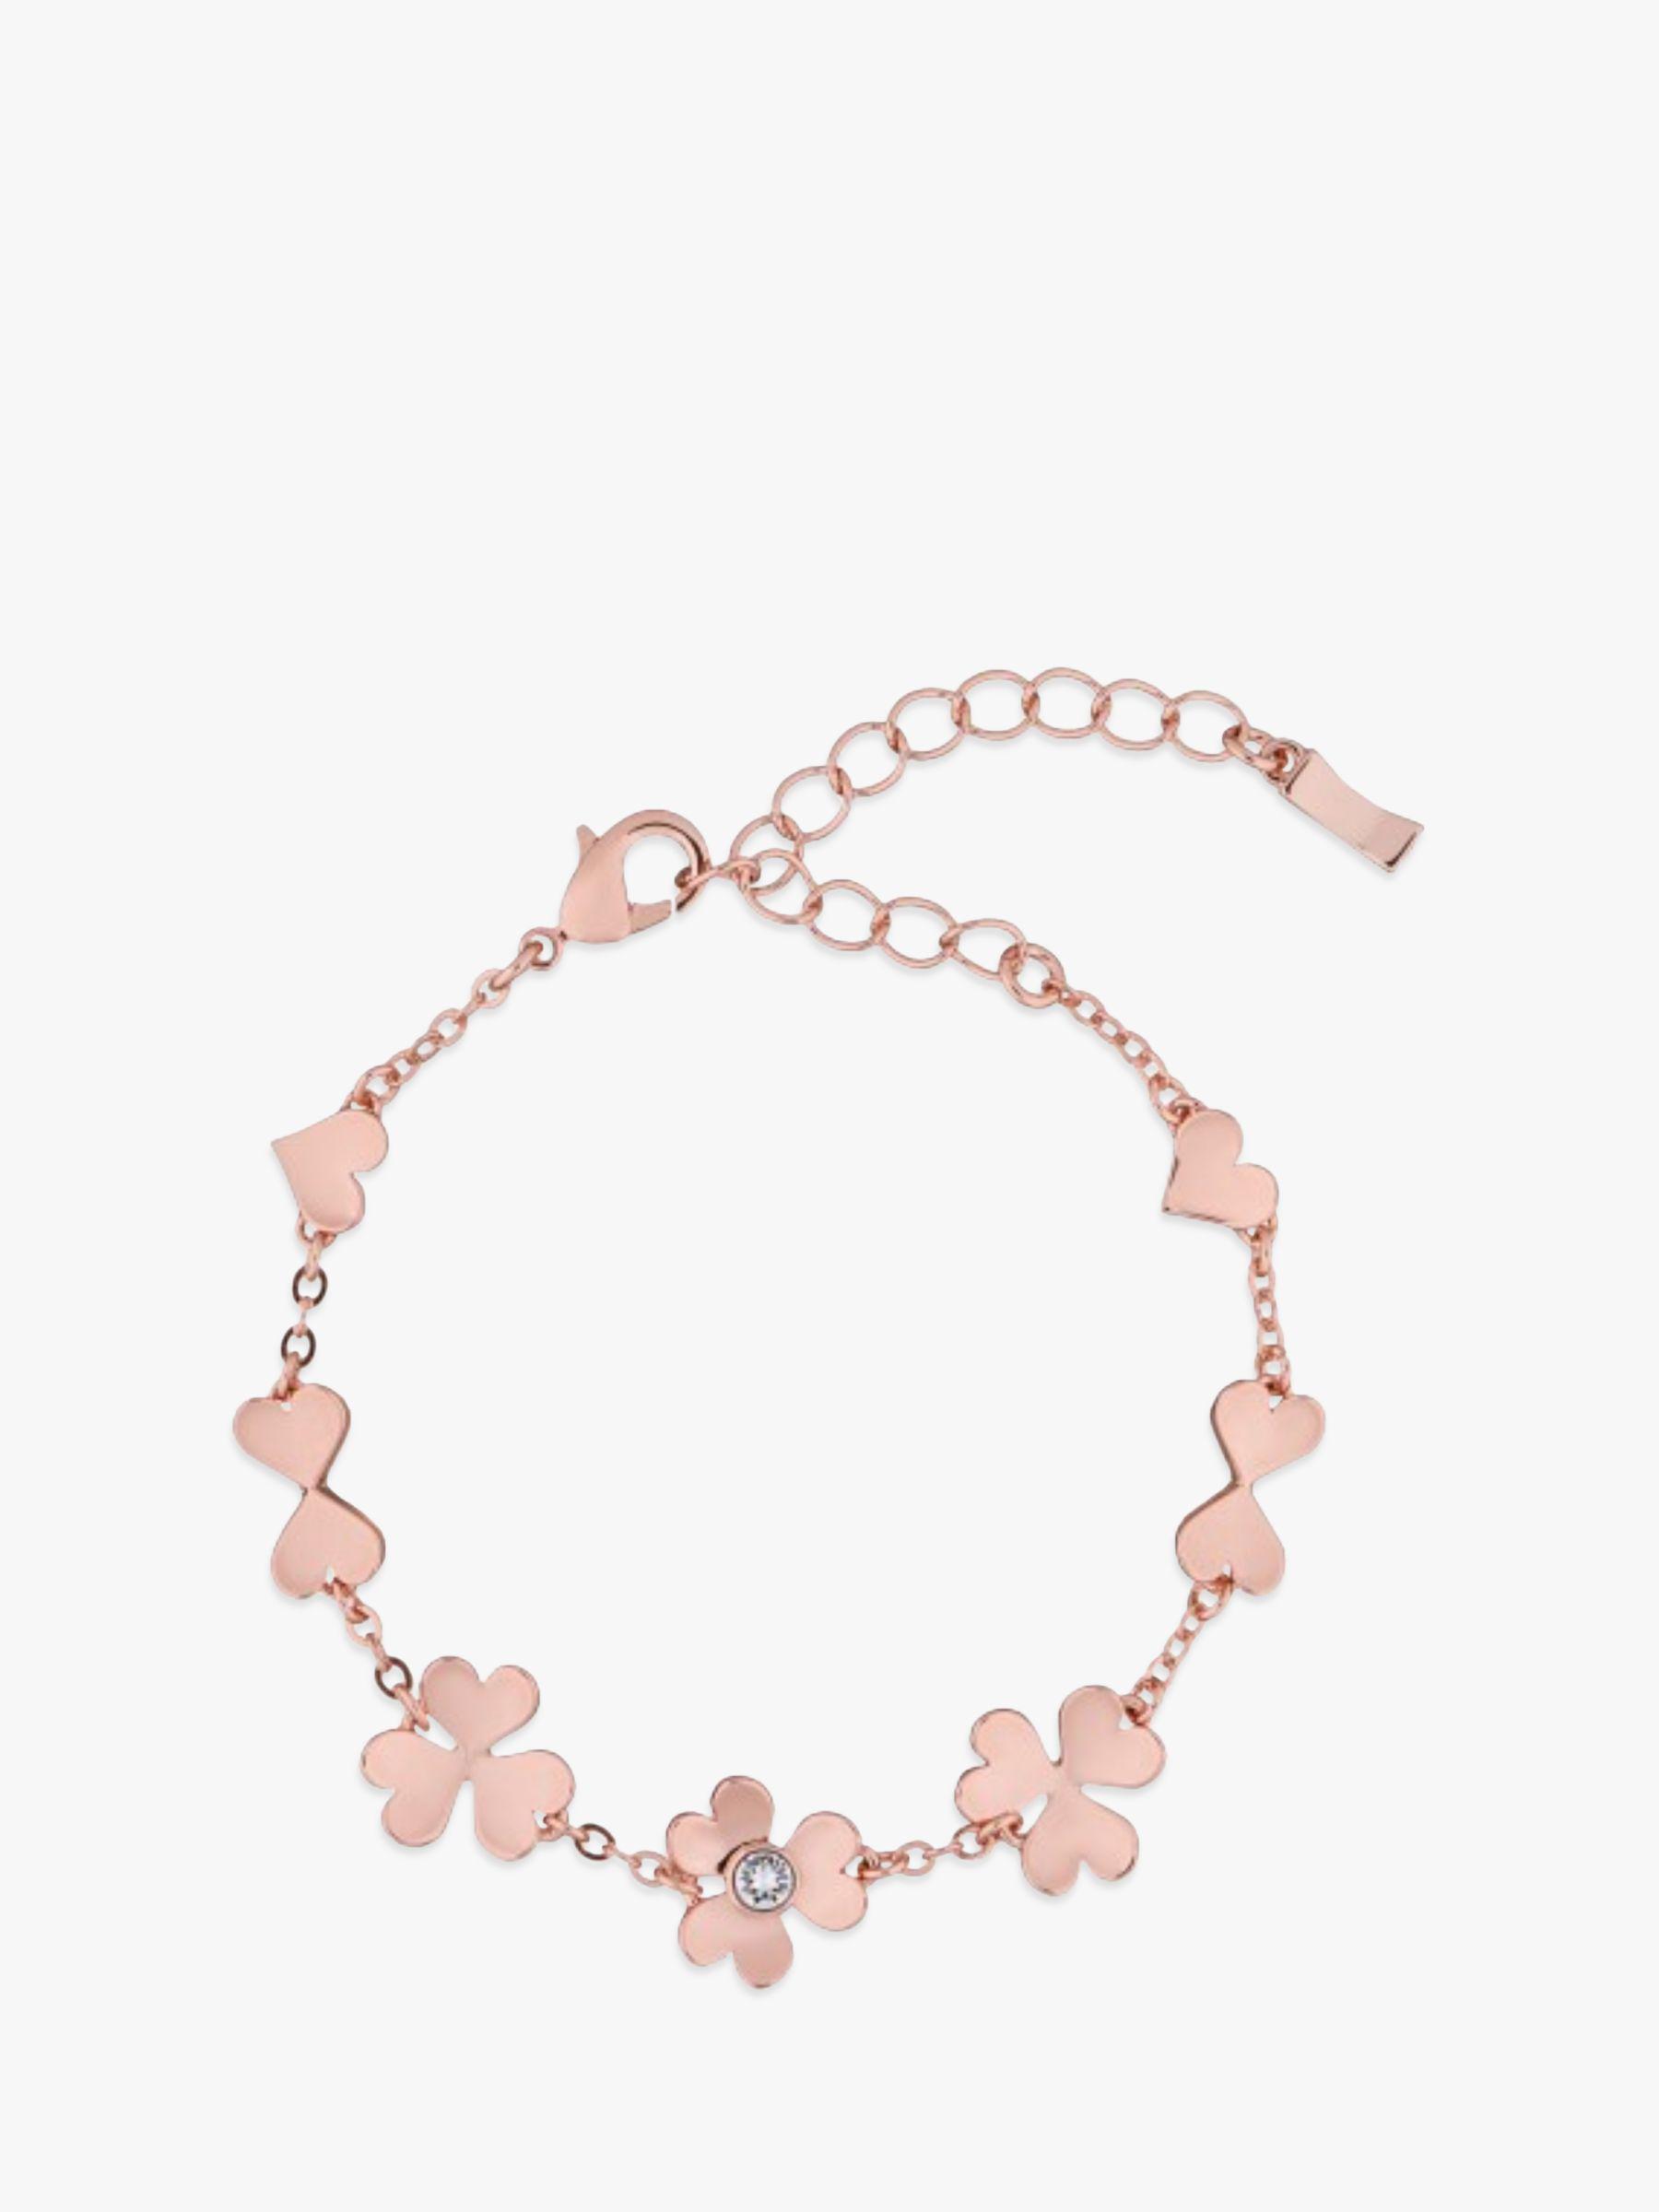 69f84badb2fc Ted Baker. Women s Metallic Hanaya Heart Blossom Chain Bracelet. £49 From John  Lewis and Partners